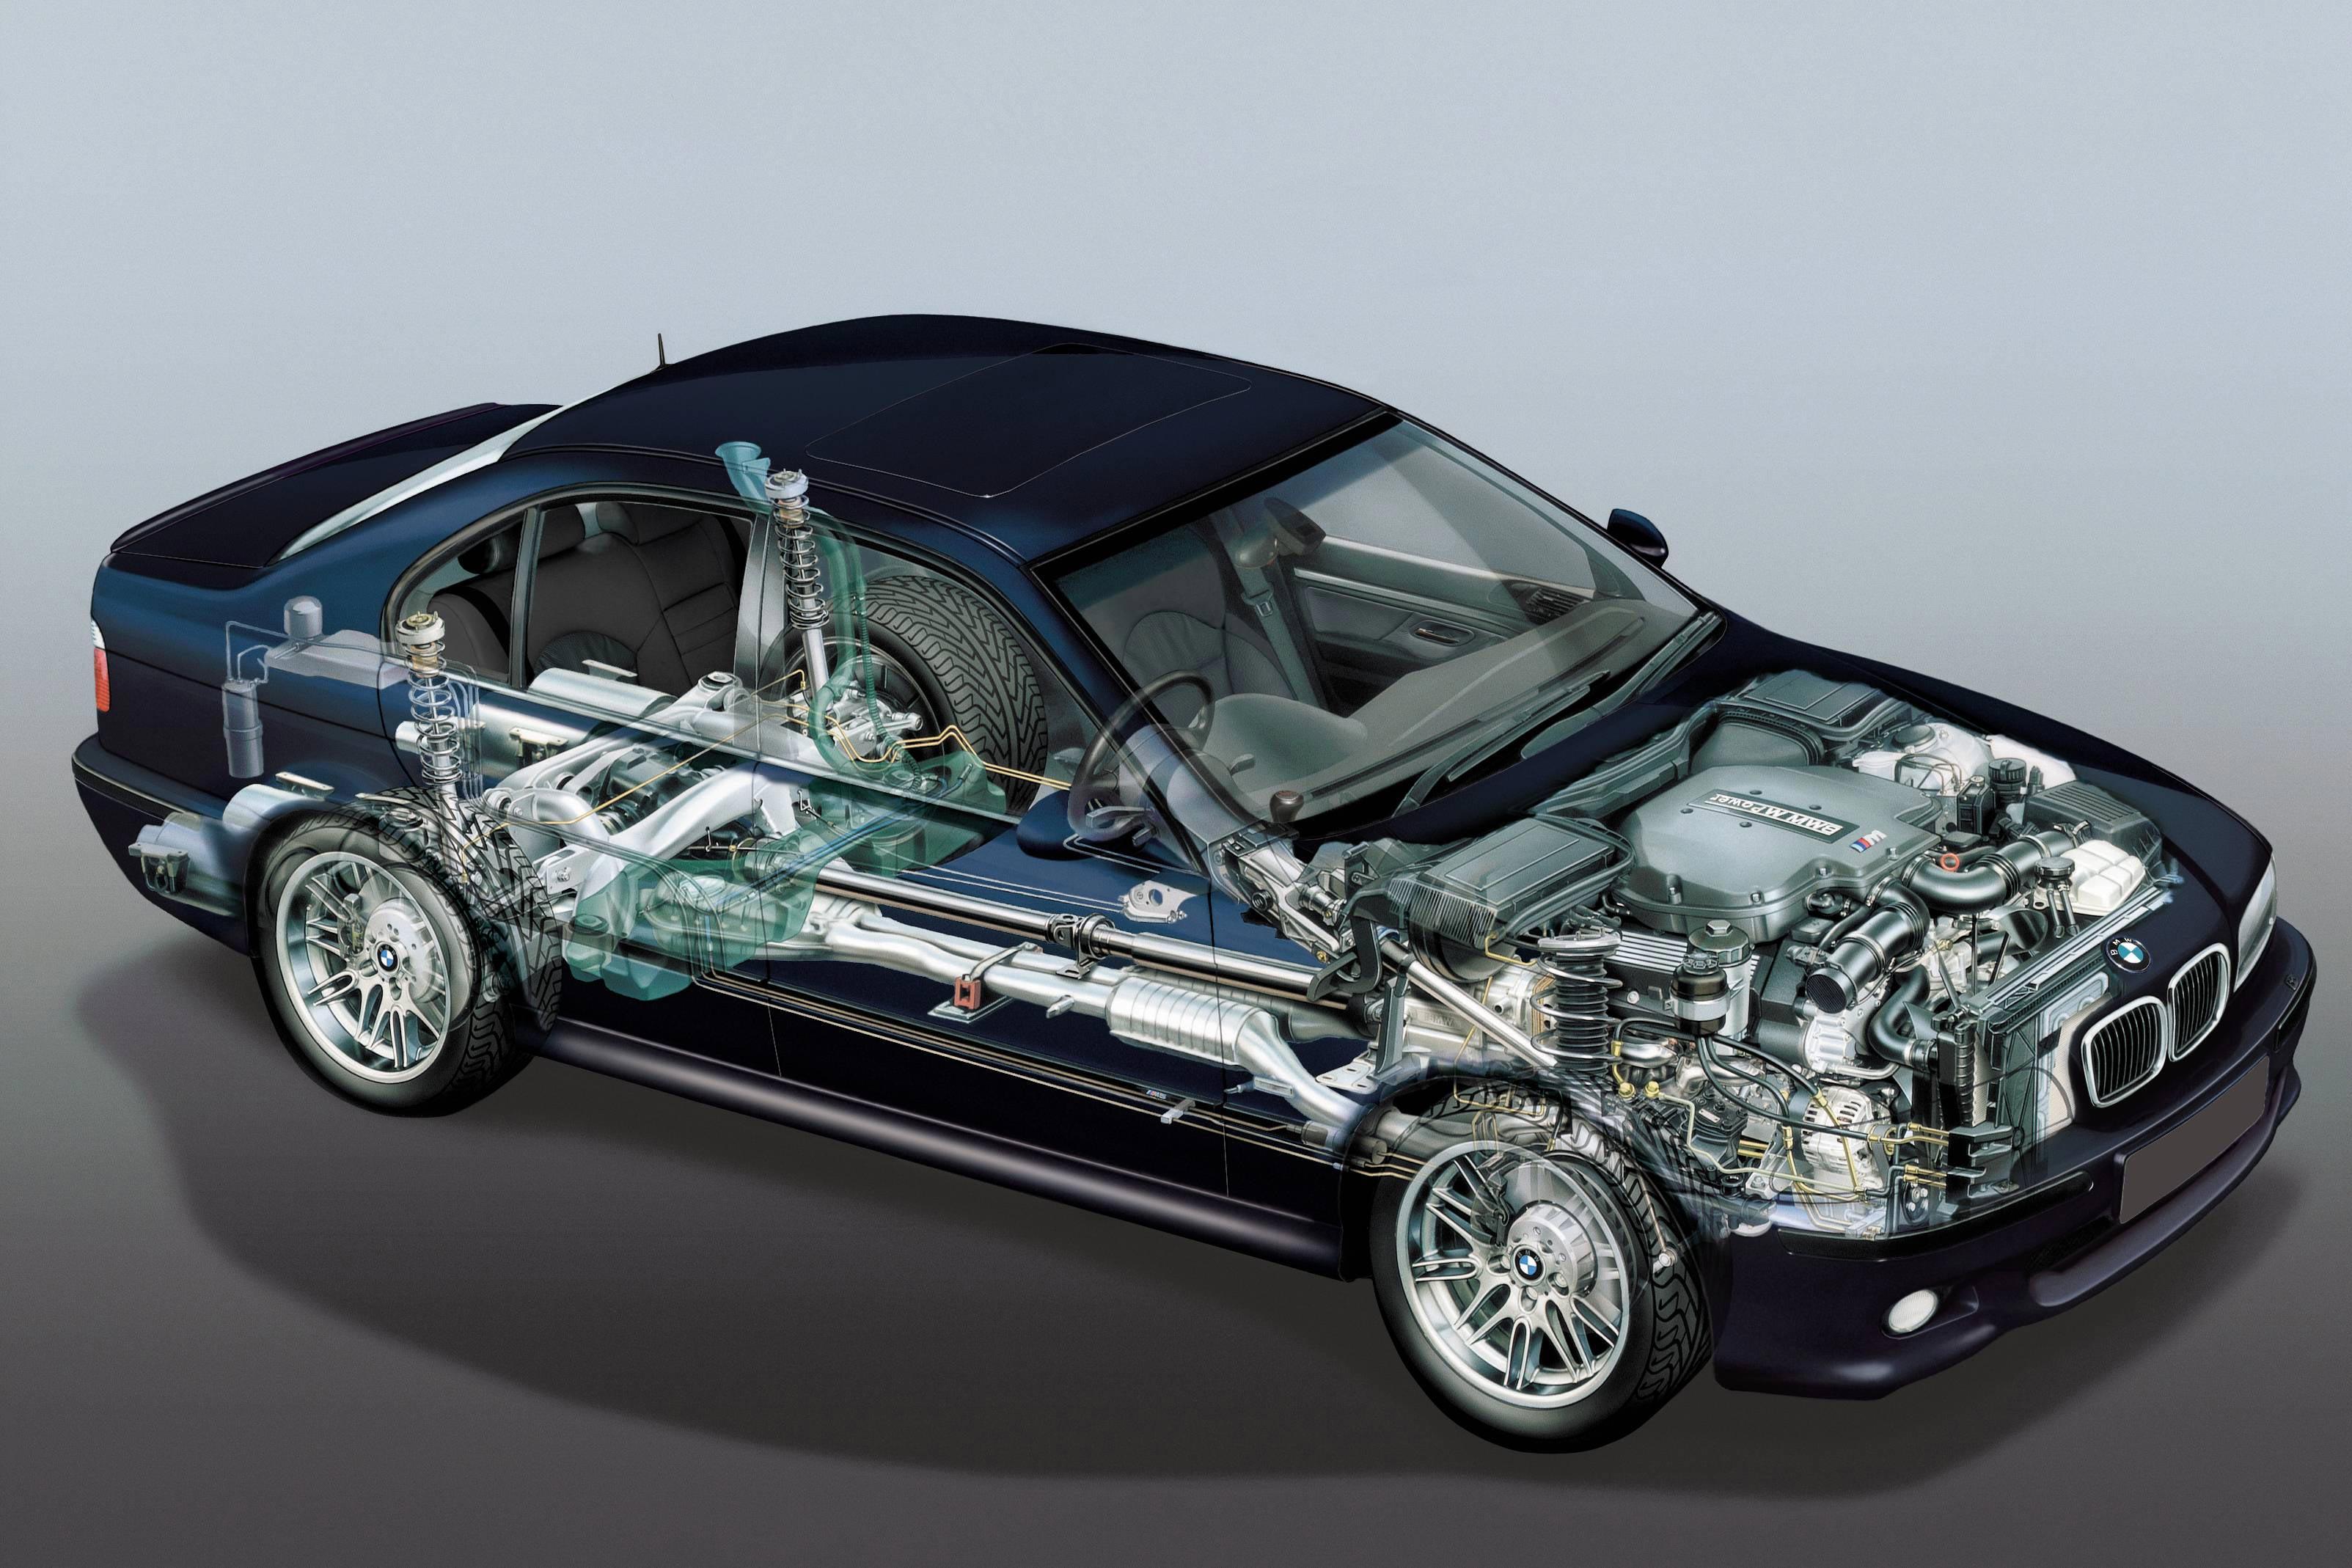 BMW 3 Series E36 cutaway